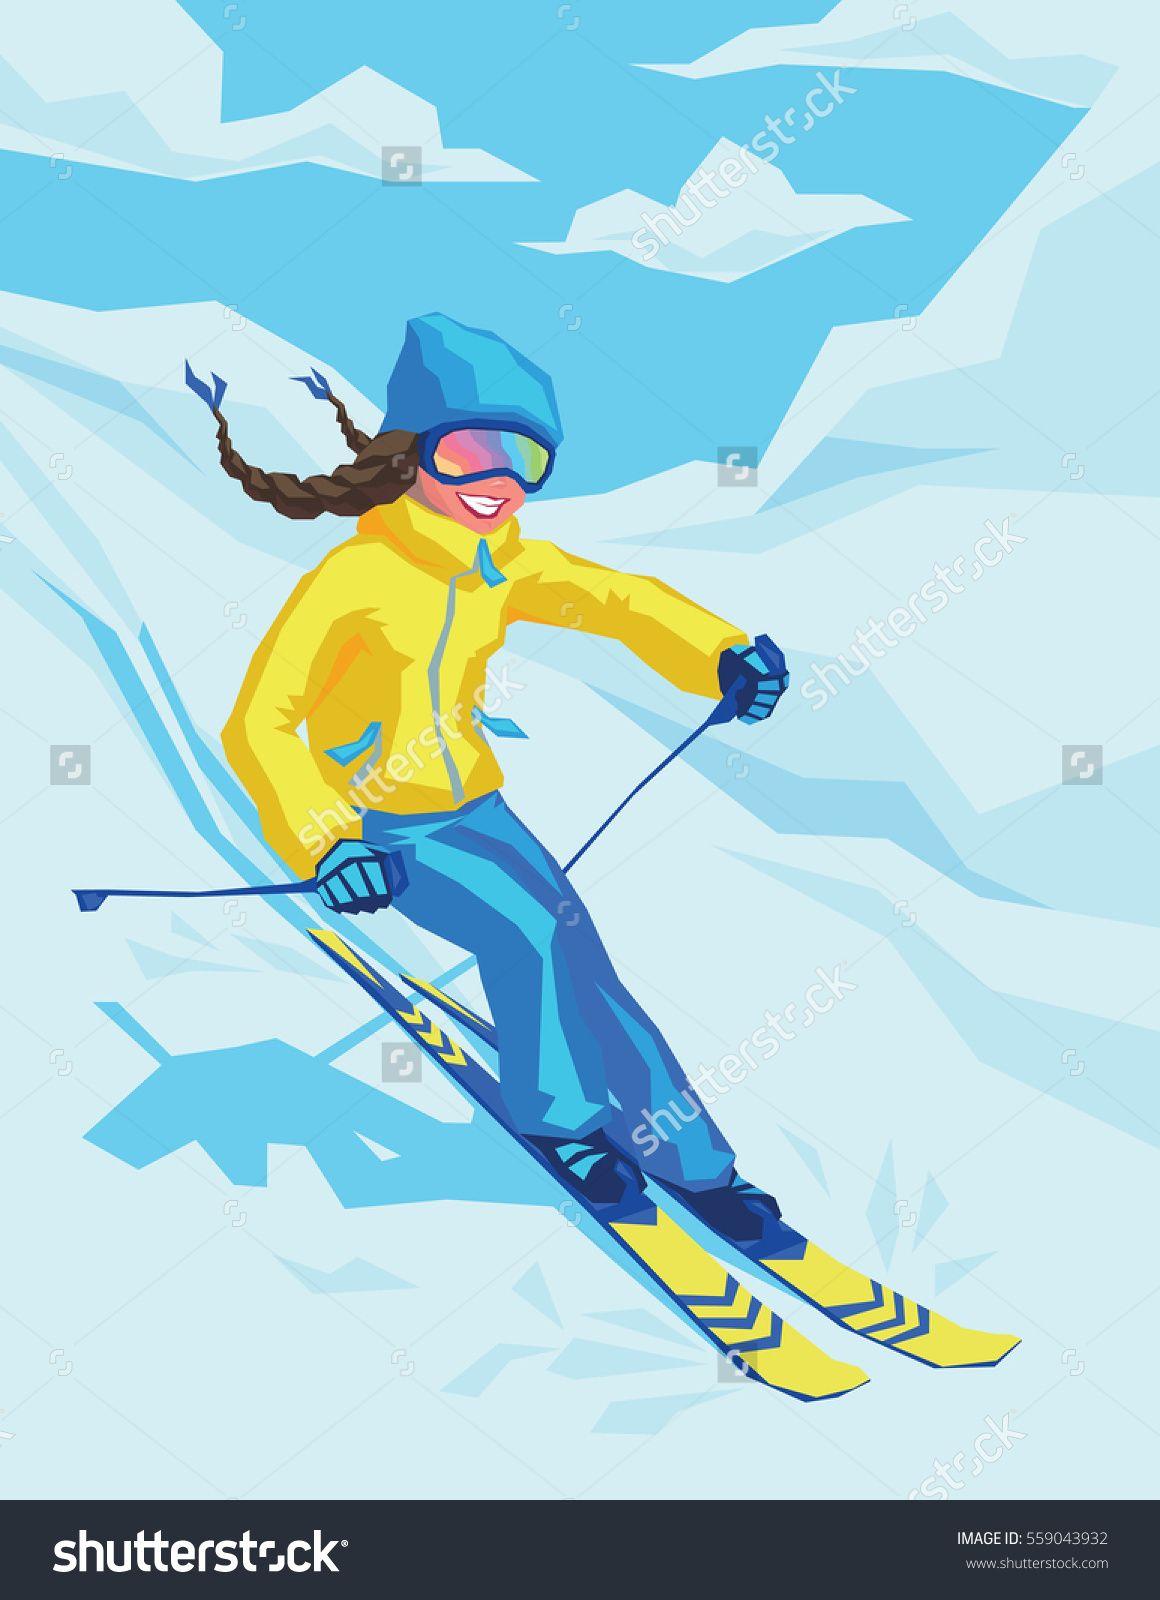 Going Downhill Fast Skiing WOMENS T-SHIRT Winter Ski Sn Funny birthday gift